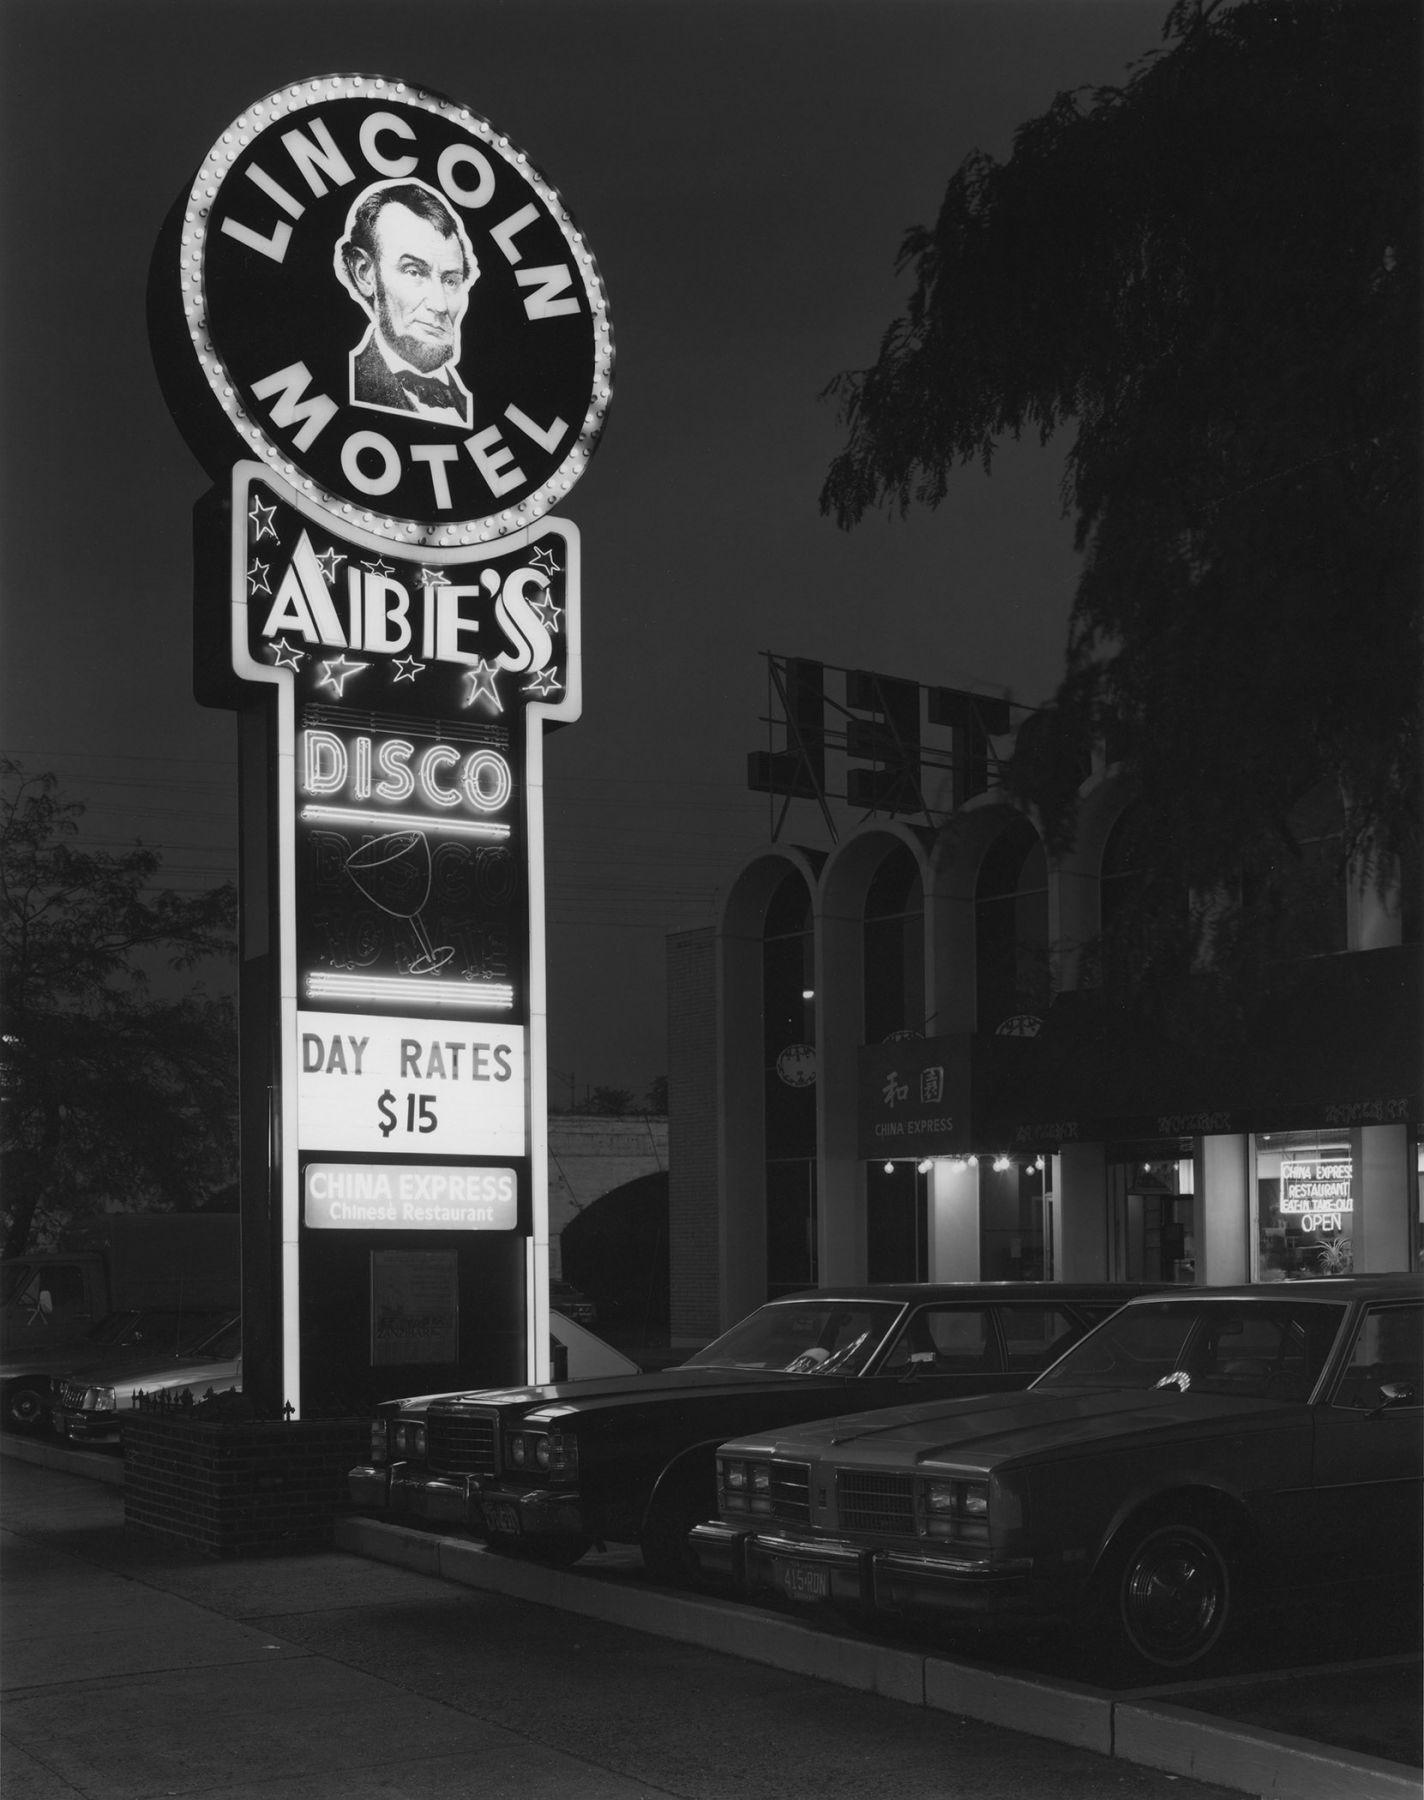 George Tice (b. 1938, Newark) Lincoln Motel and Abe's Disco, Newark, NJ 1981, printed 2/3/82 Selenium waxed gelatin silver print